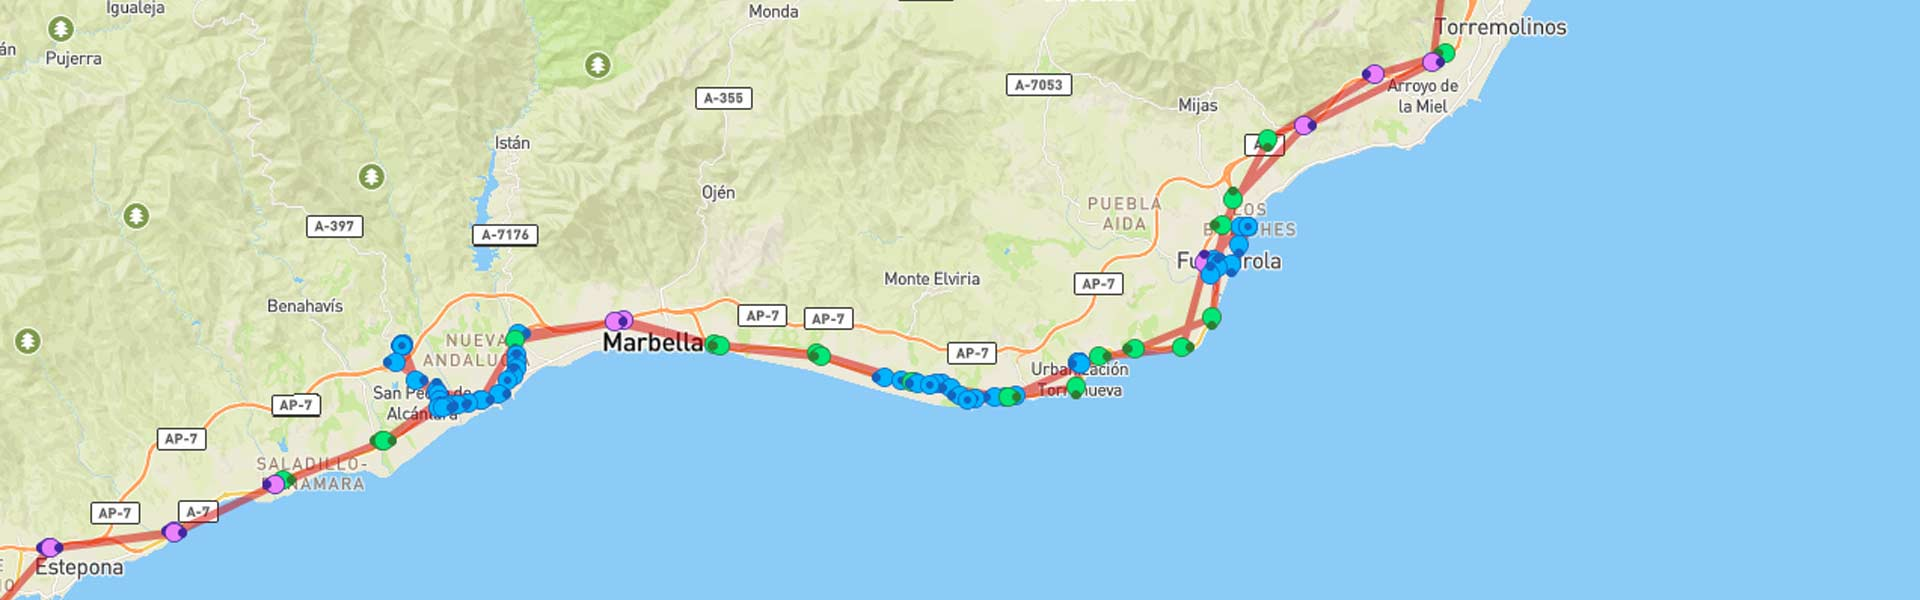 GPS Trackers in Spain